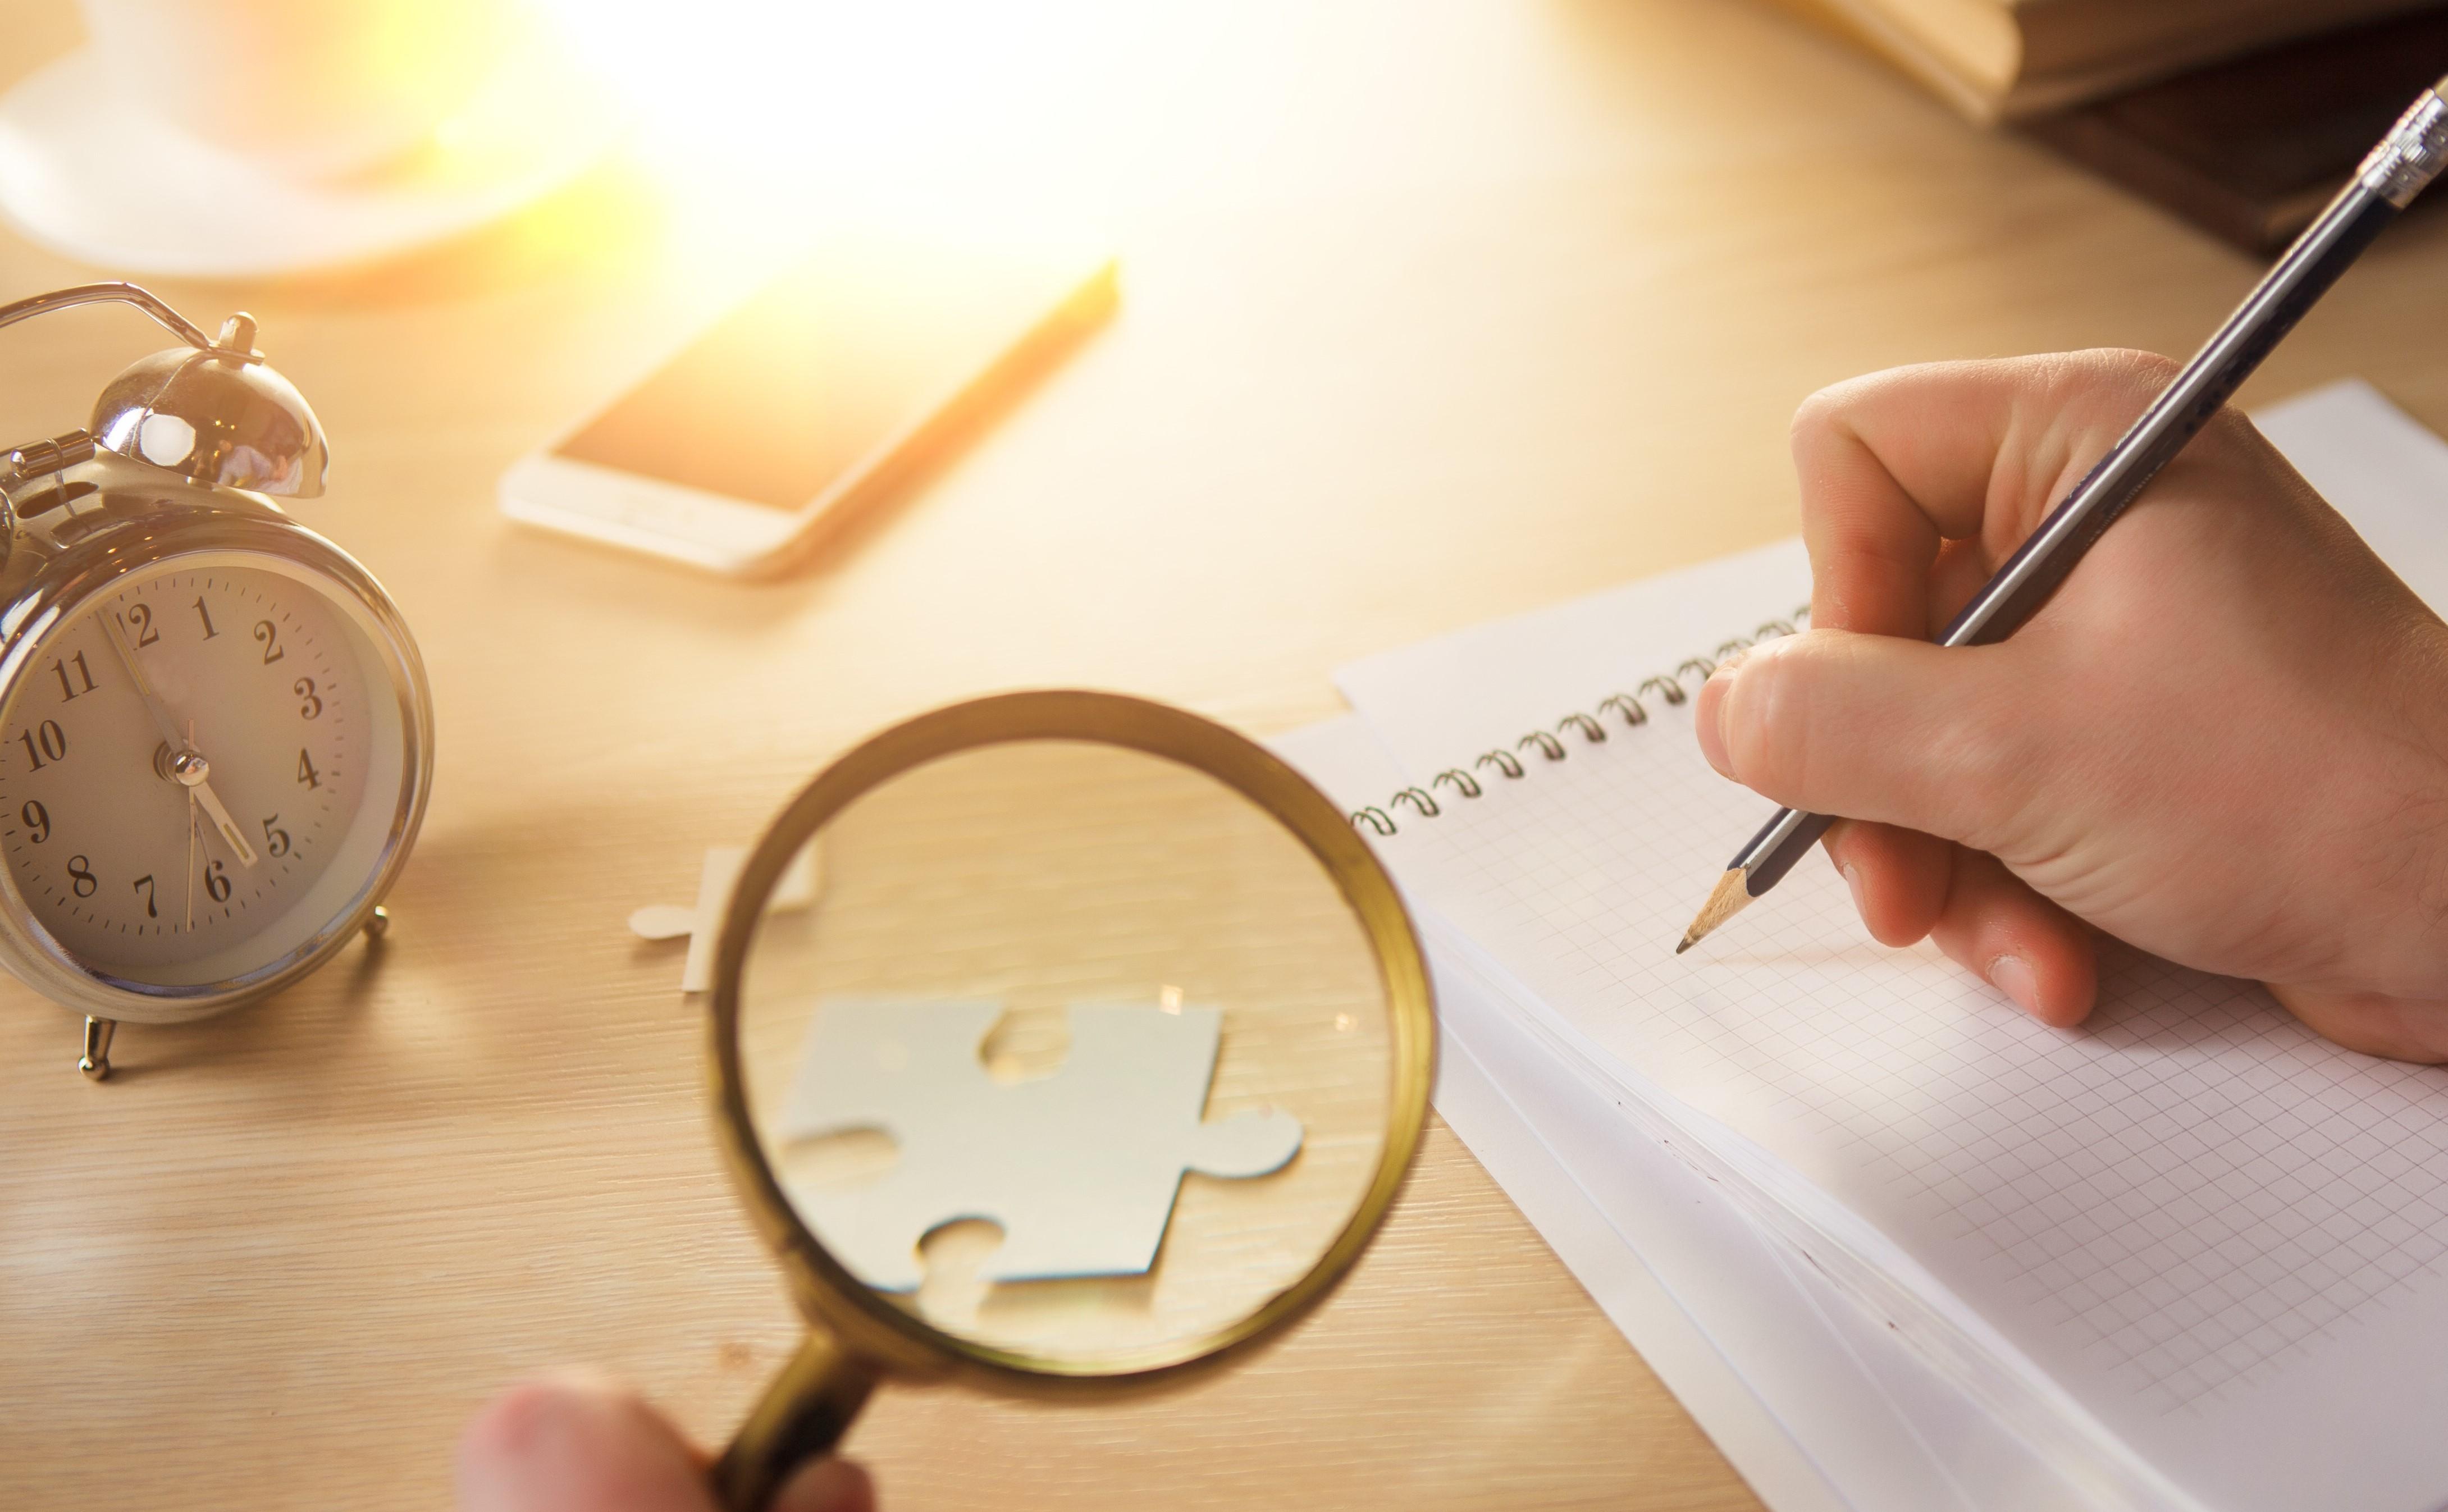 Anbud365: Under ny terskel: Omstilling for leverandører og søkelys på Kofa